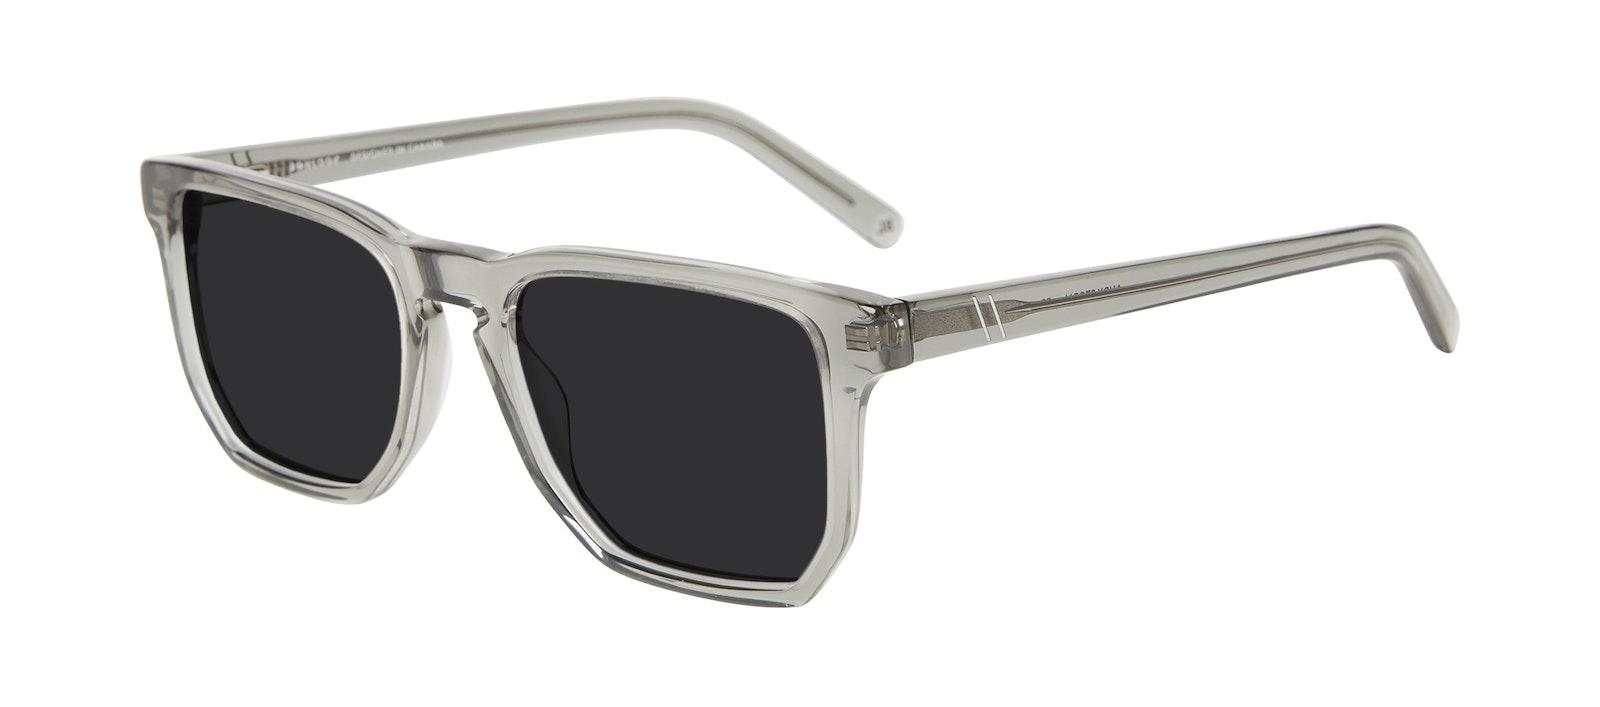 Affordable Fashion Glasses Square Sunglasses Men Andy Storm Tilt